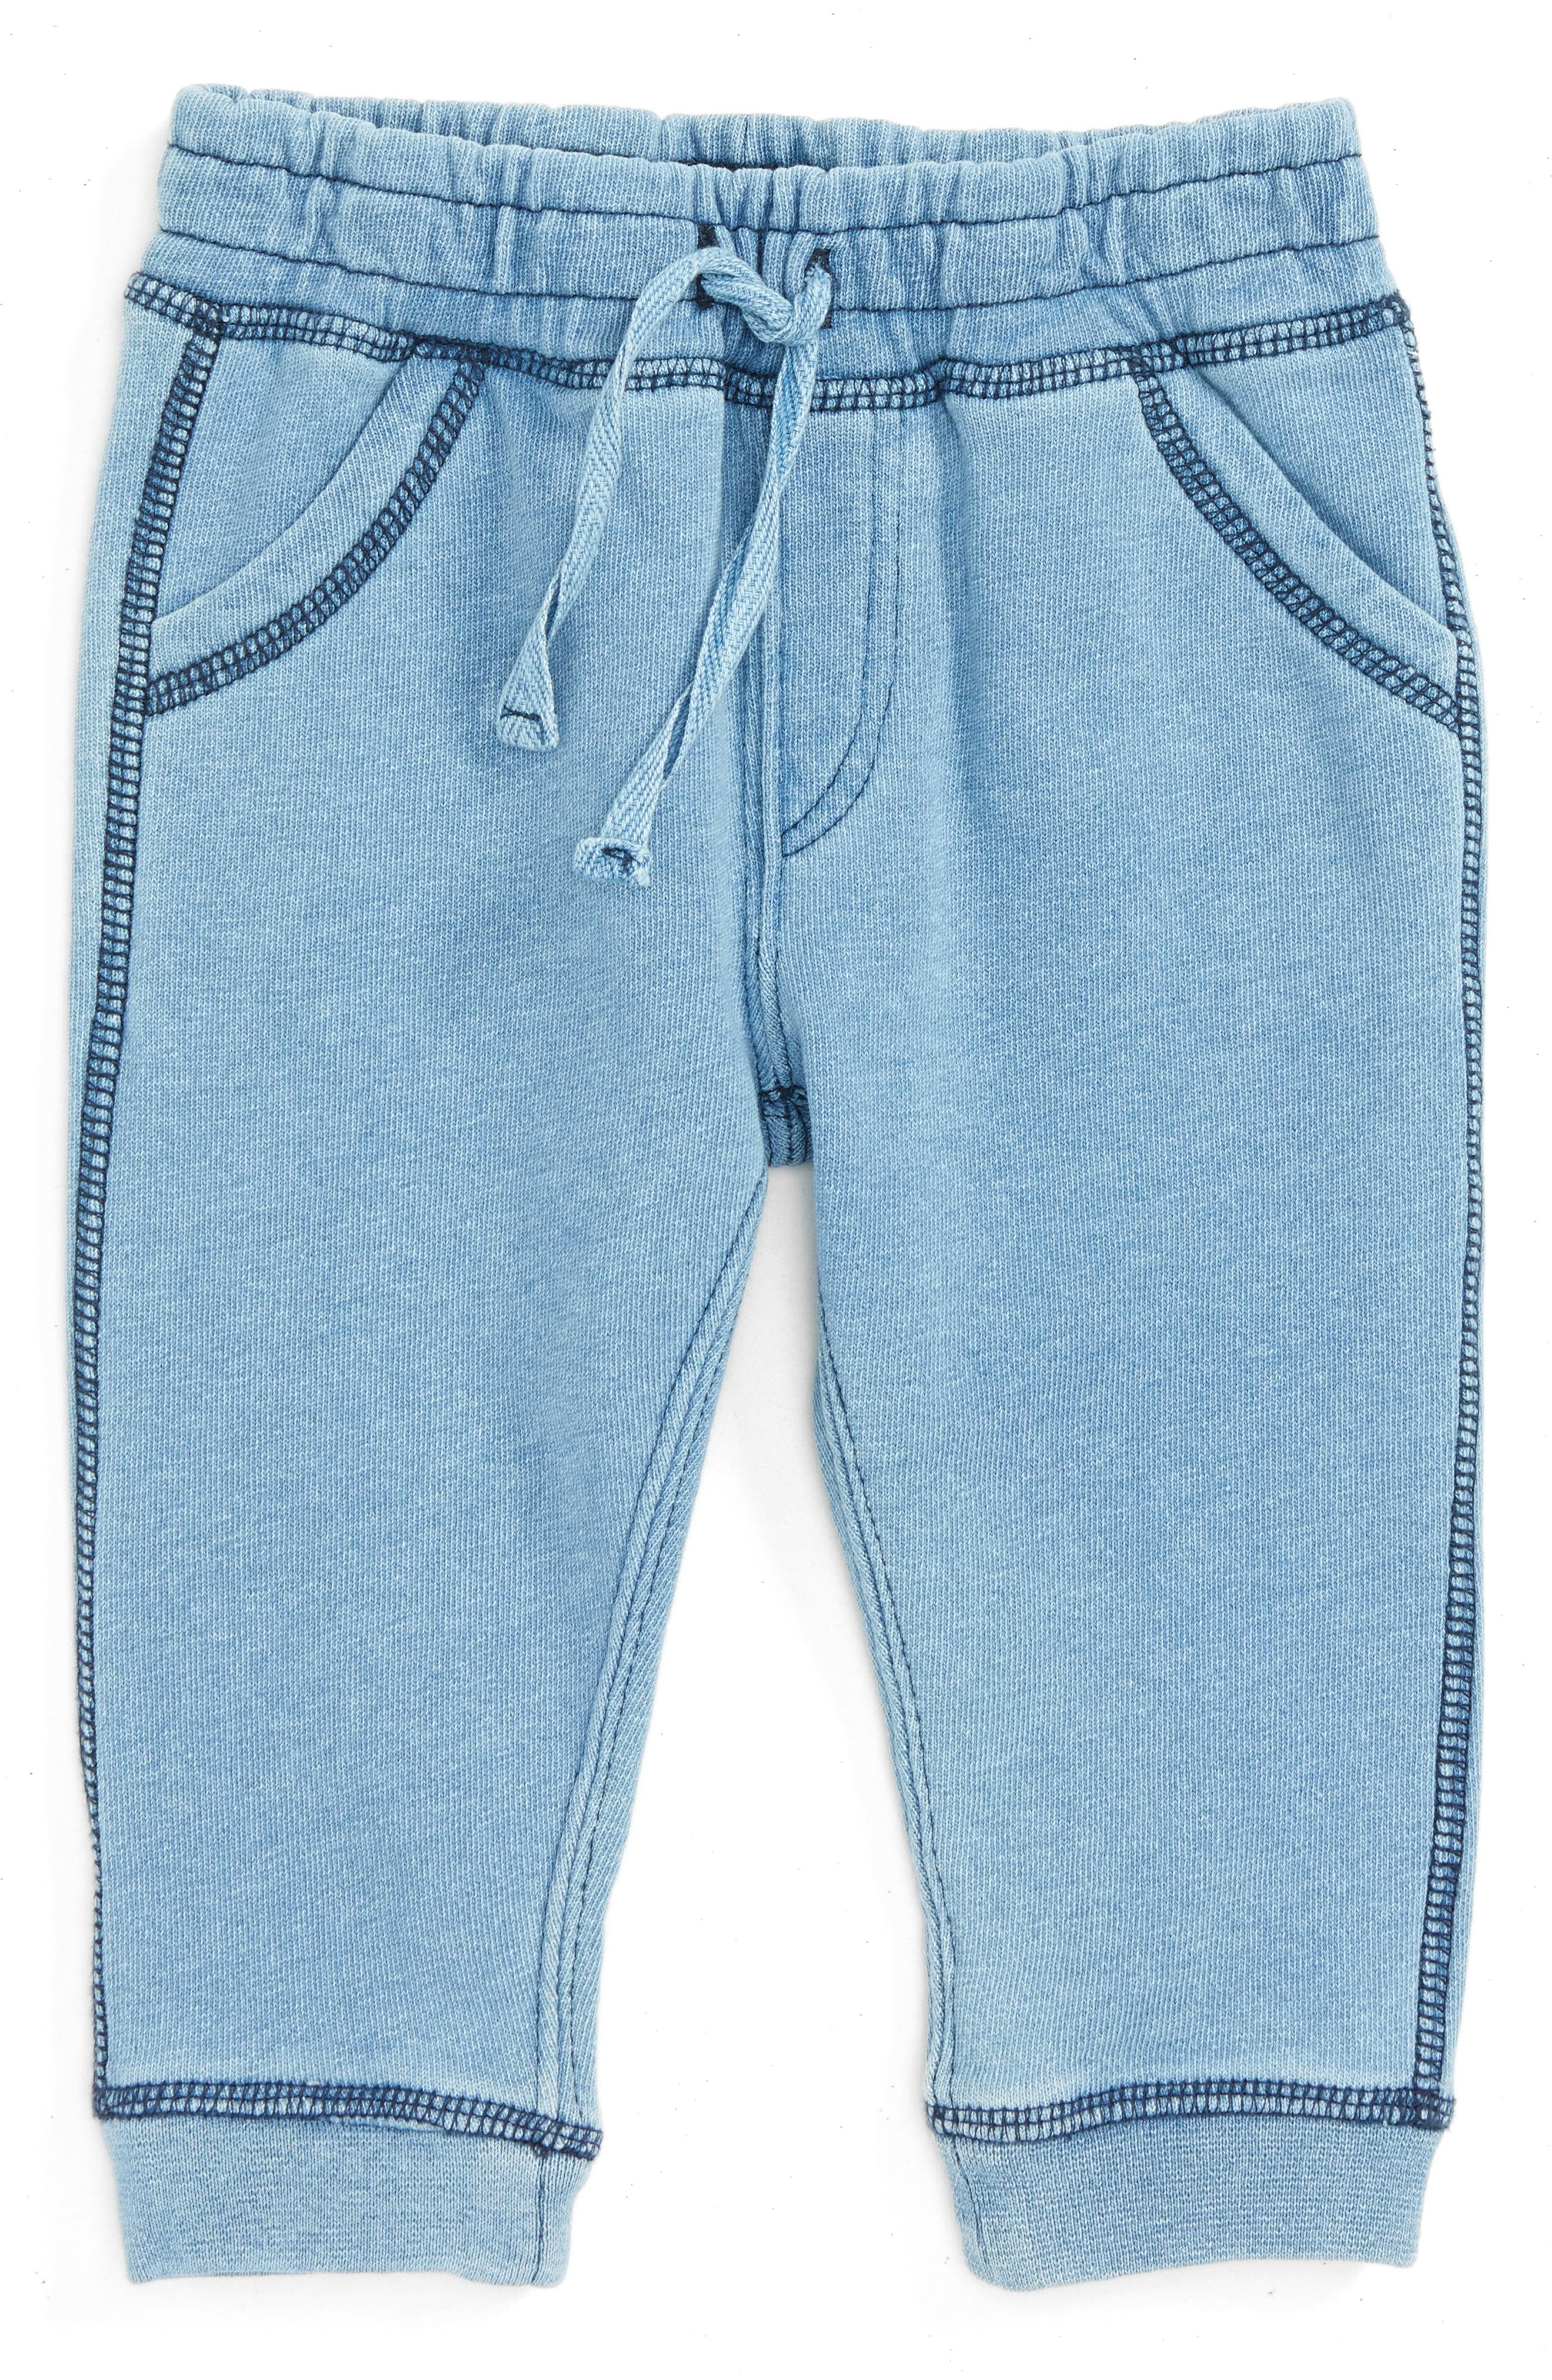 TUCKER + TATE Knit Denim Pants, Main, color, BLUE INDIGO